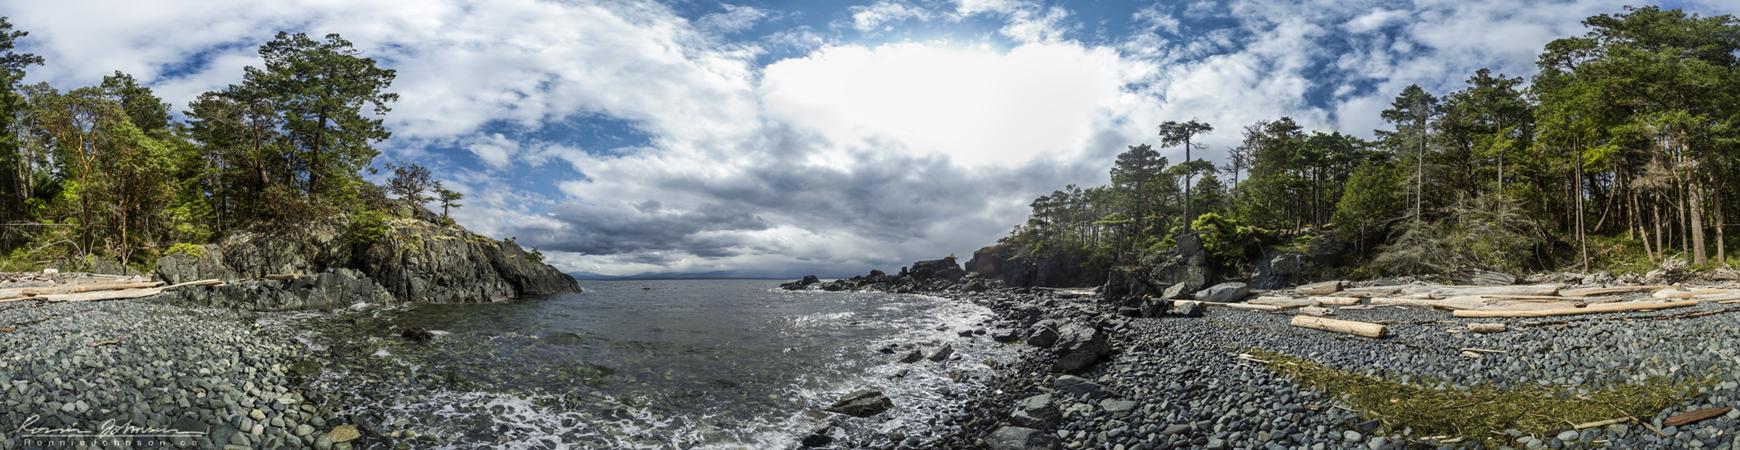 Hidden Bay by Lasqueti-Ronnie